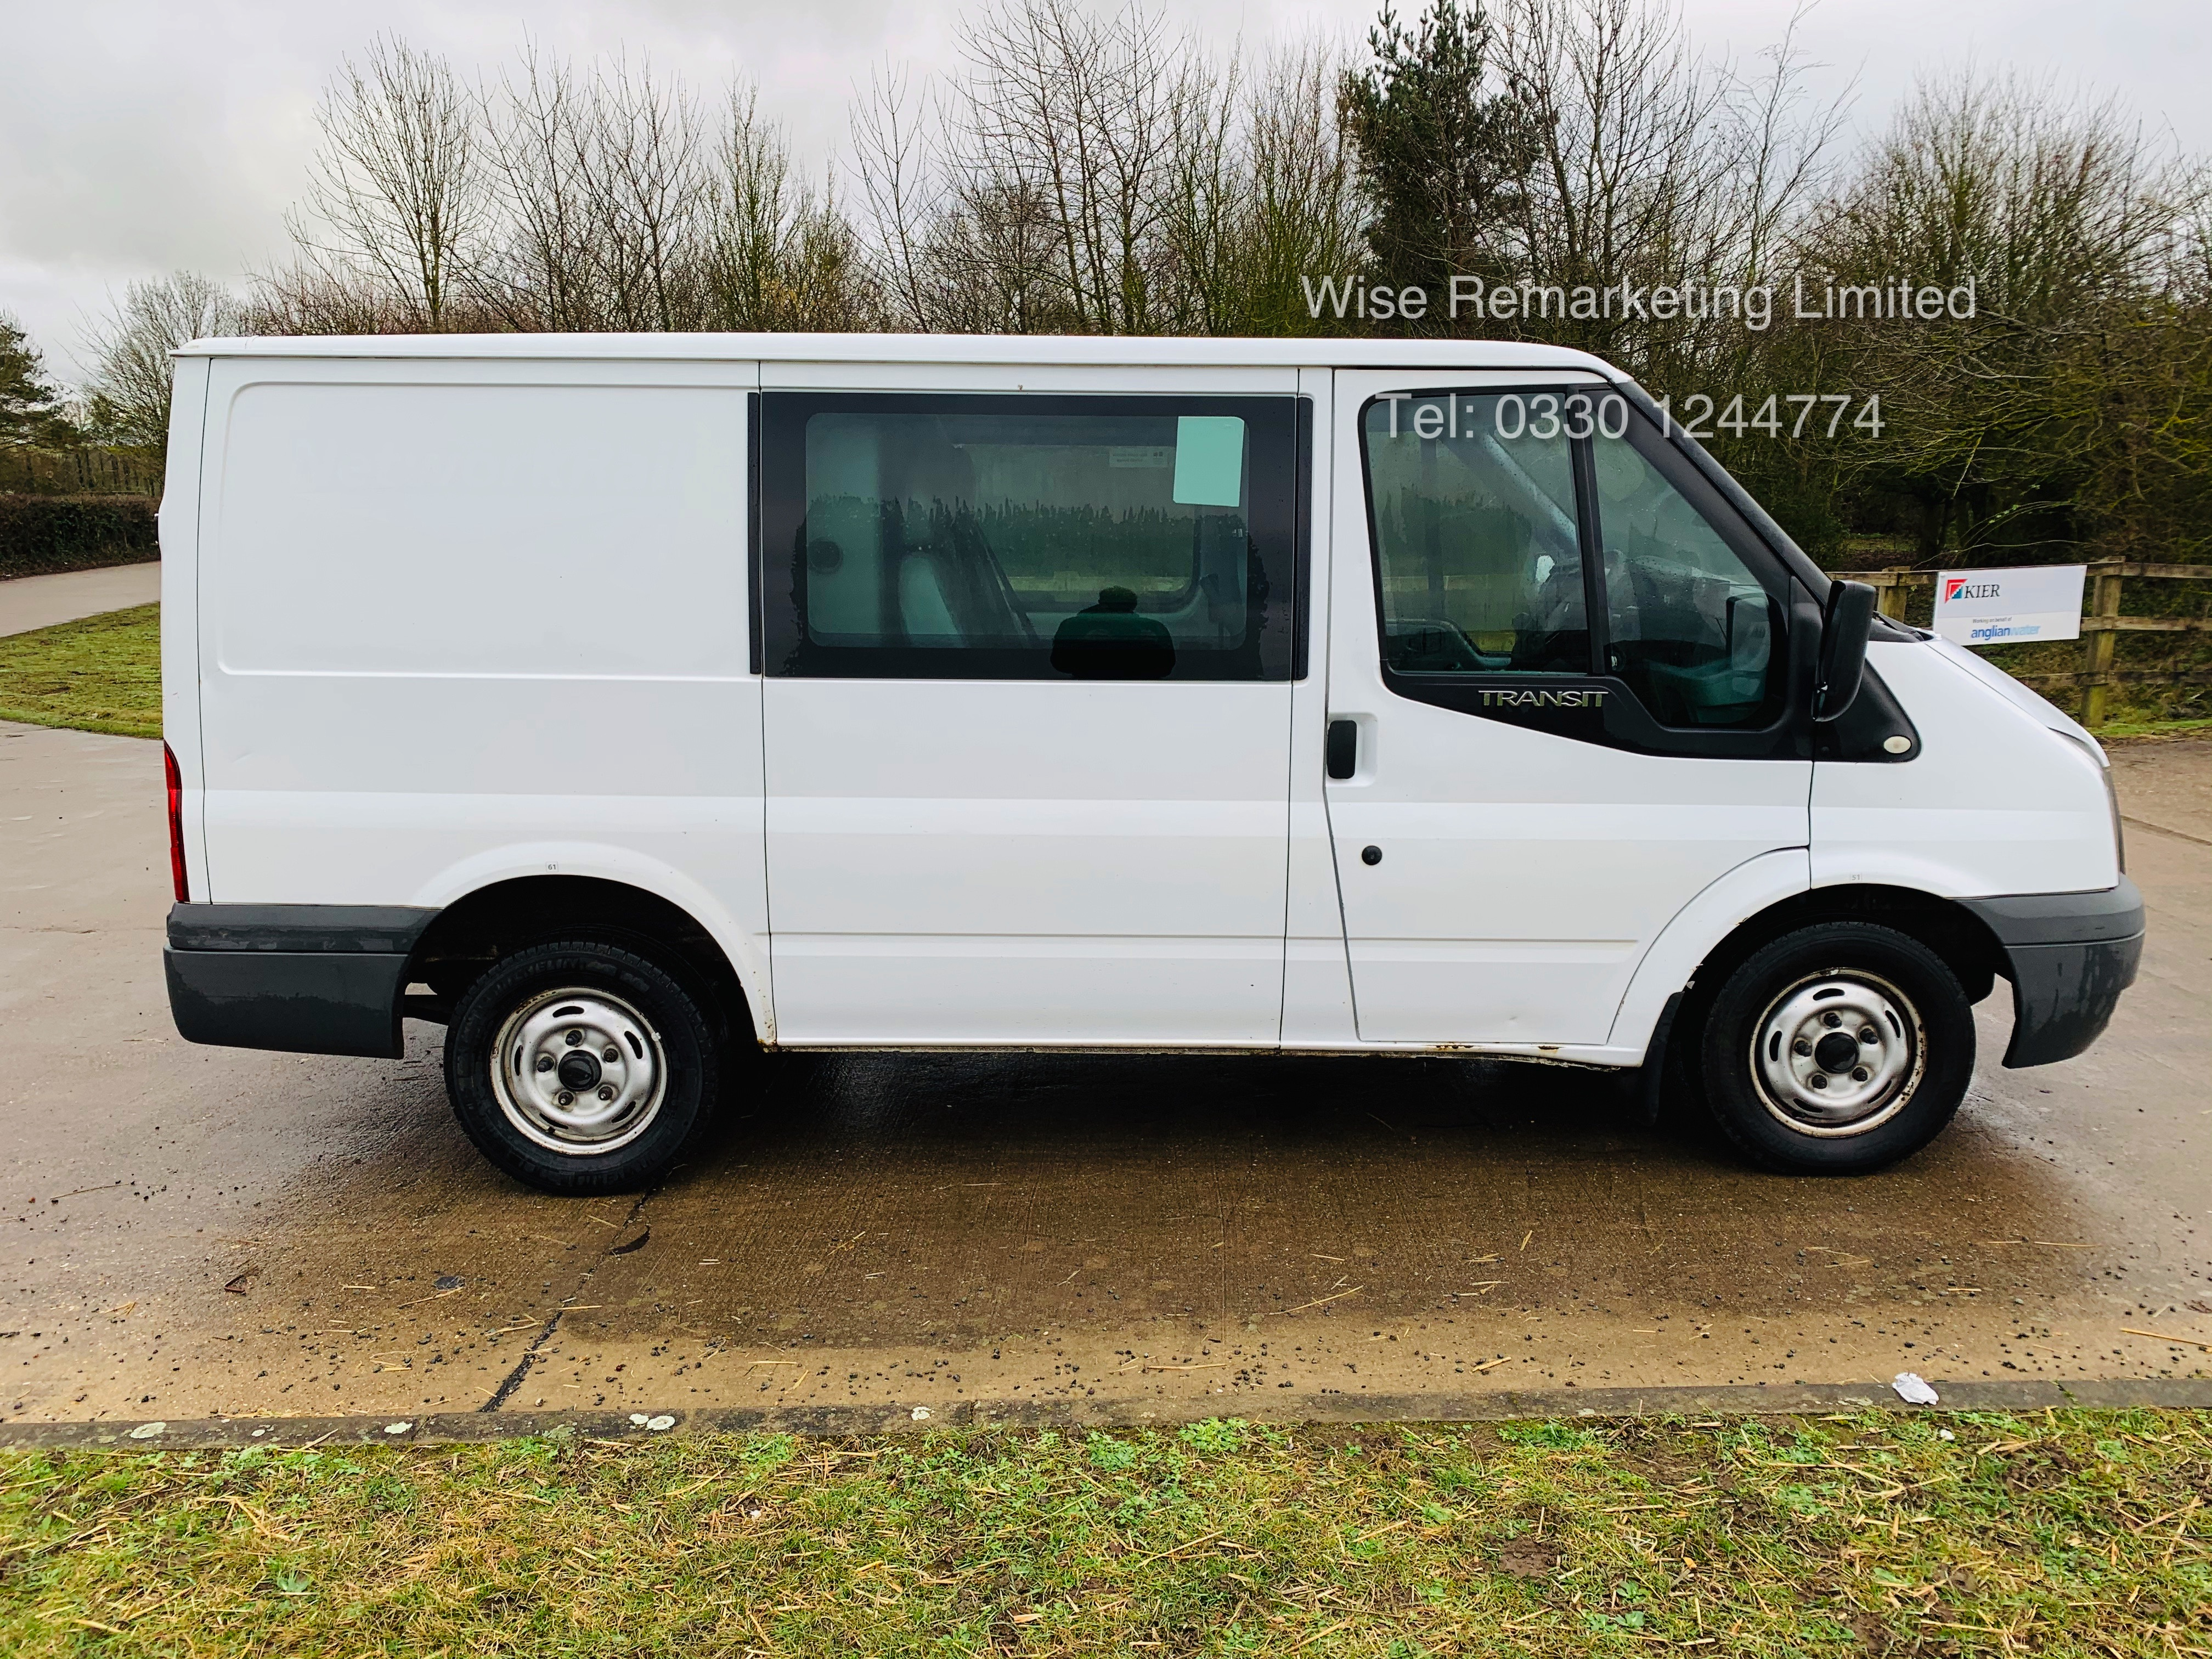 (RESERVE MET) Ford Transit T280 2.2 TDCI Dualliner Crew Van (6 Seater) - 2012 Model - 1 Year MOT - Image 5 of 15